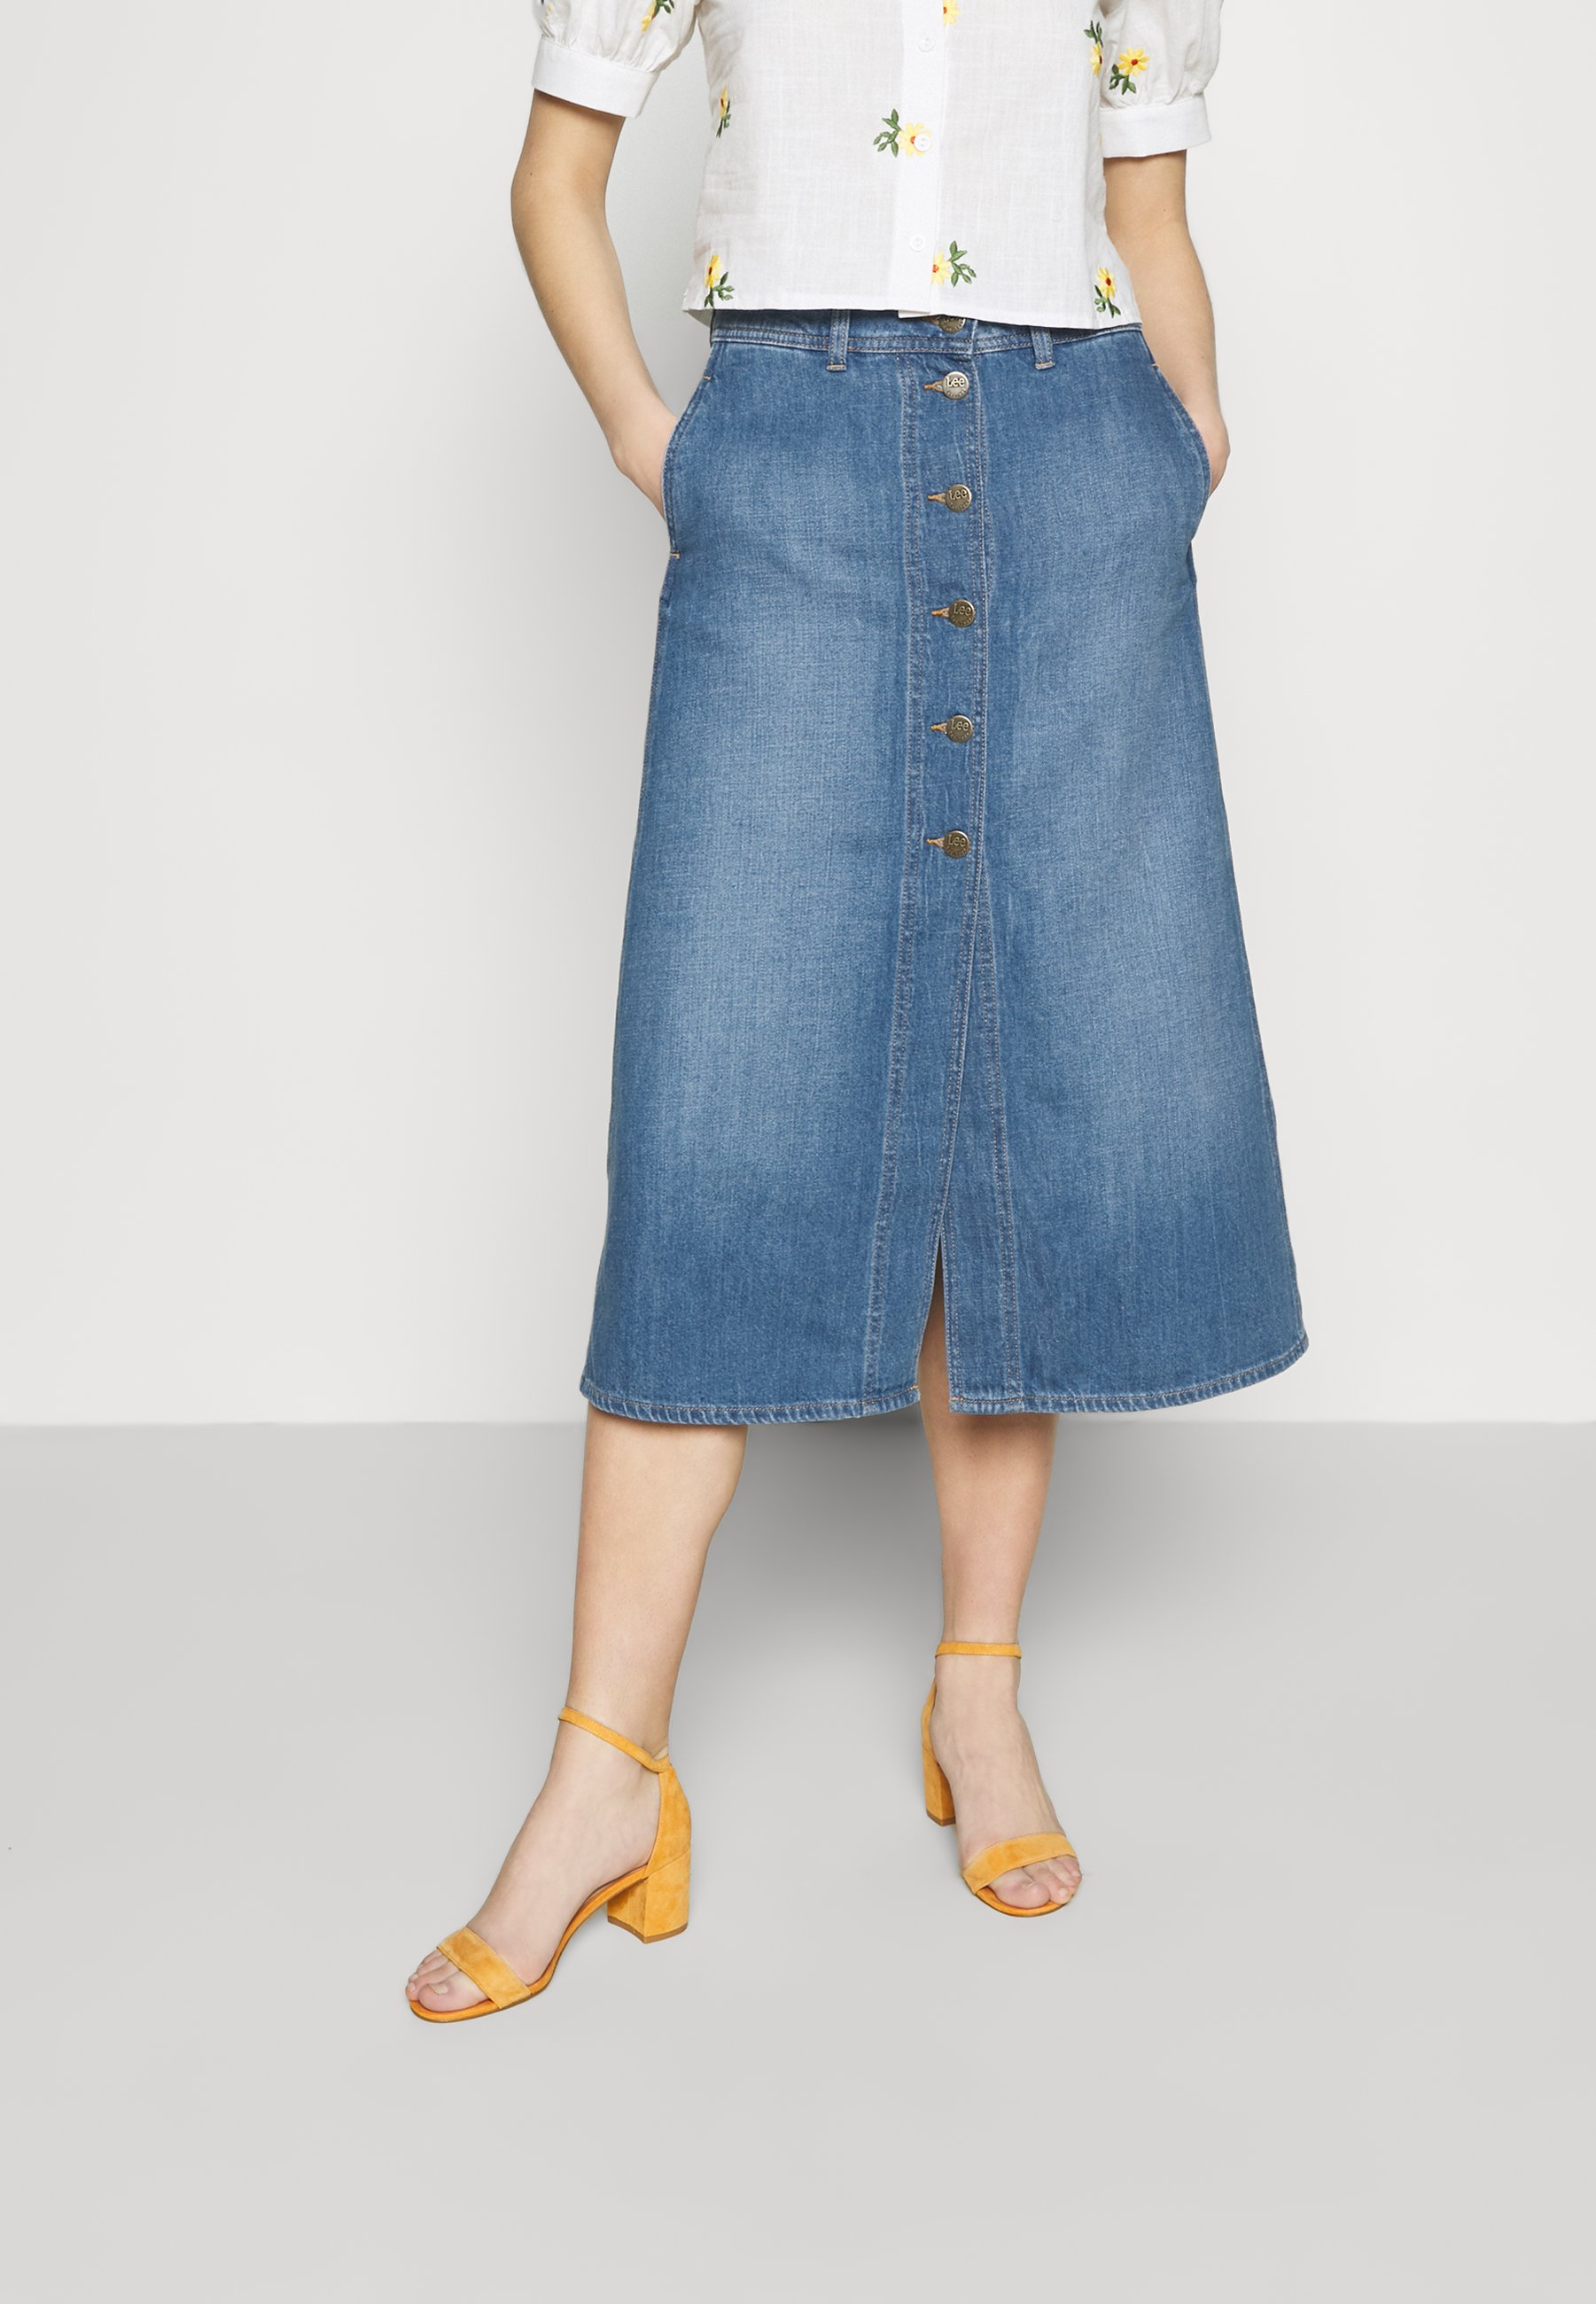 Femme BUTTON THROUGH - Jupe en jean